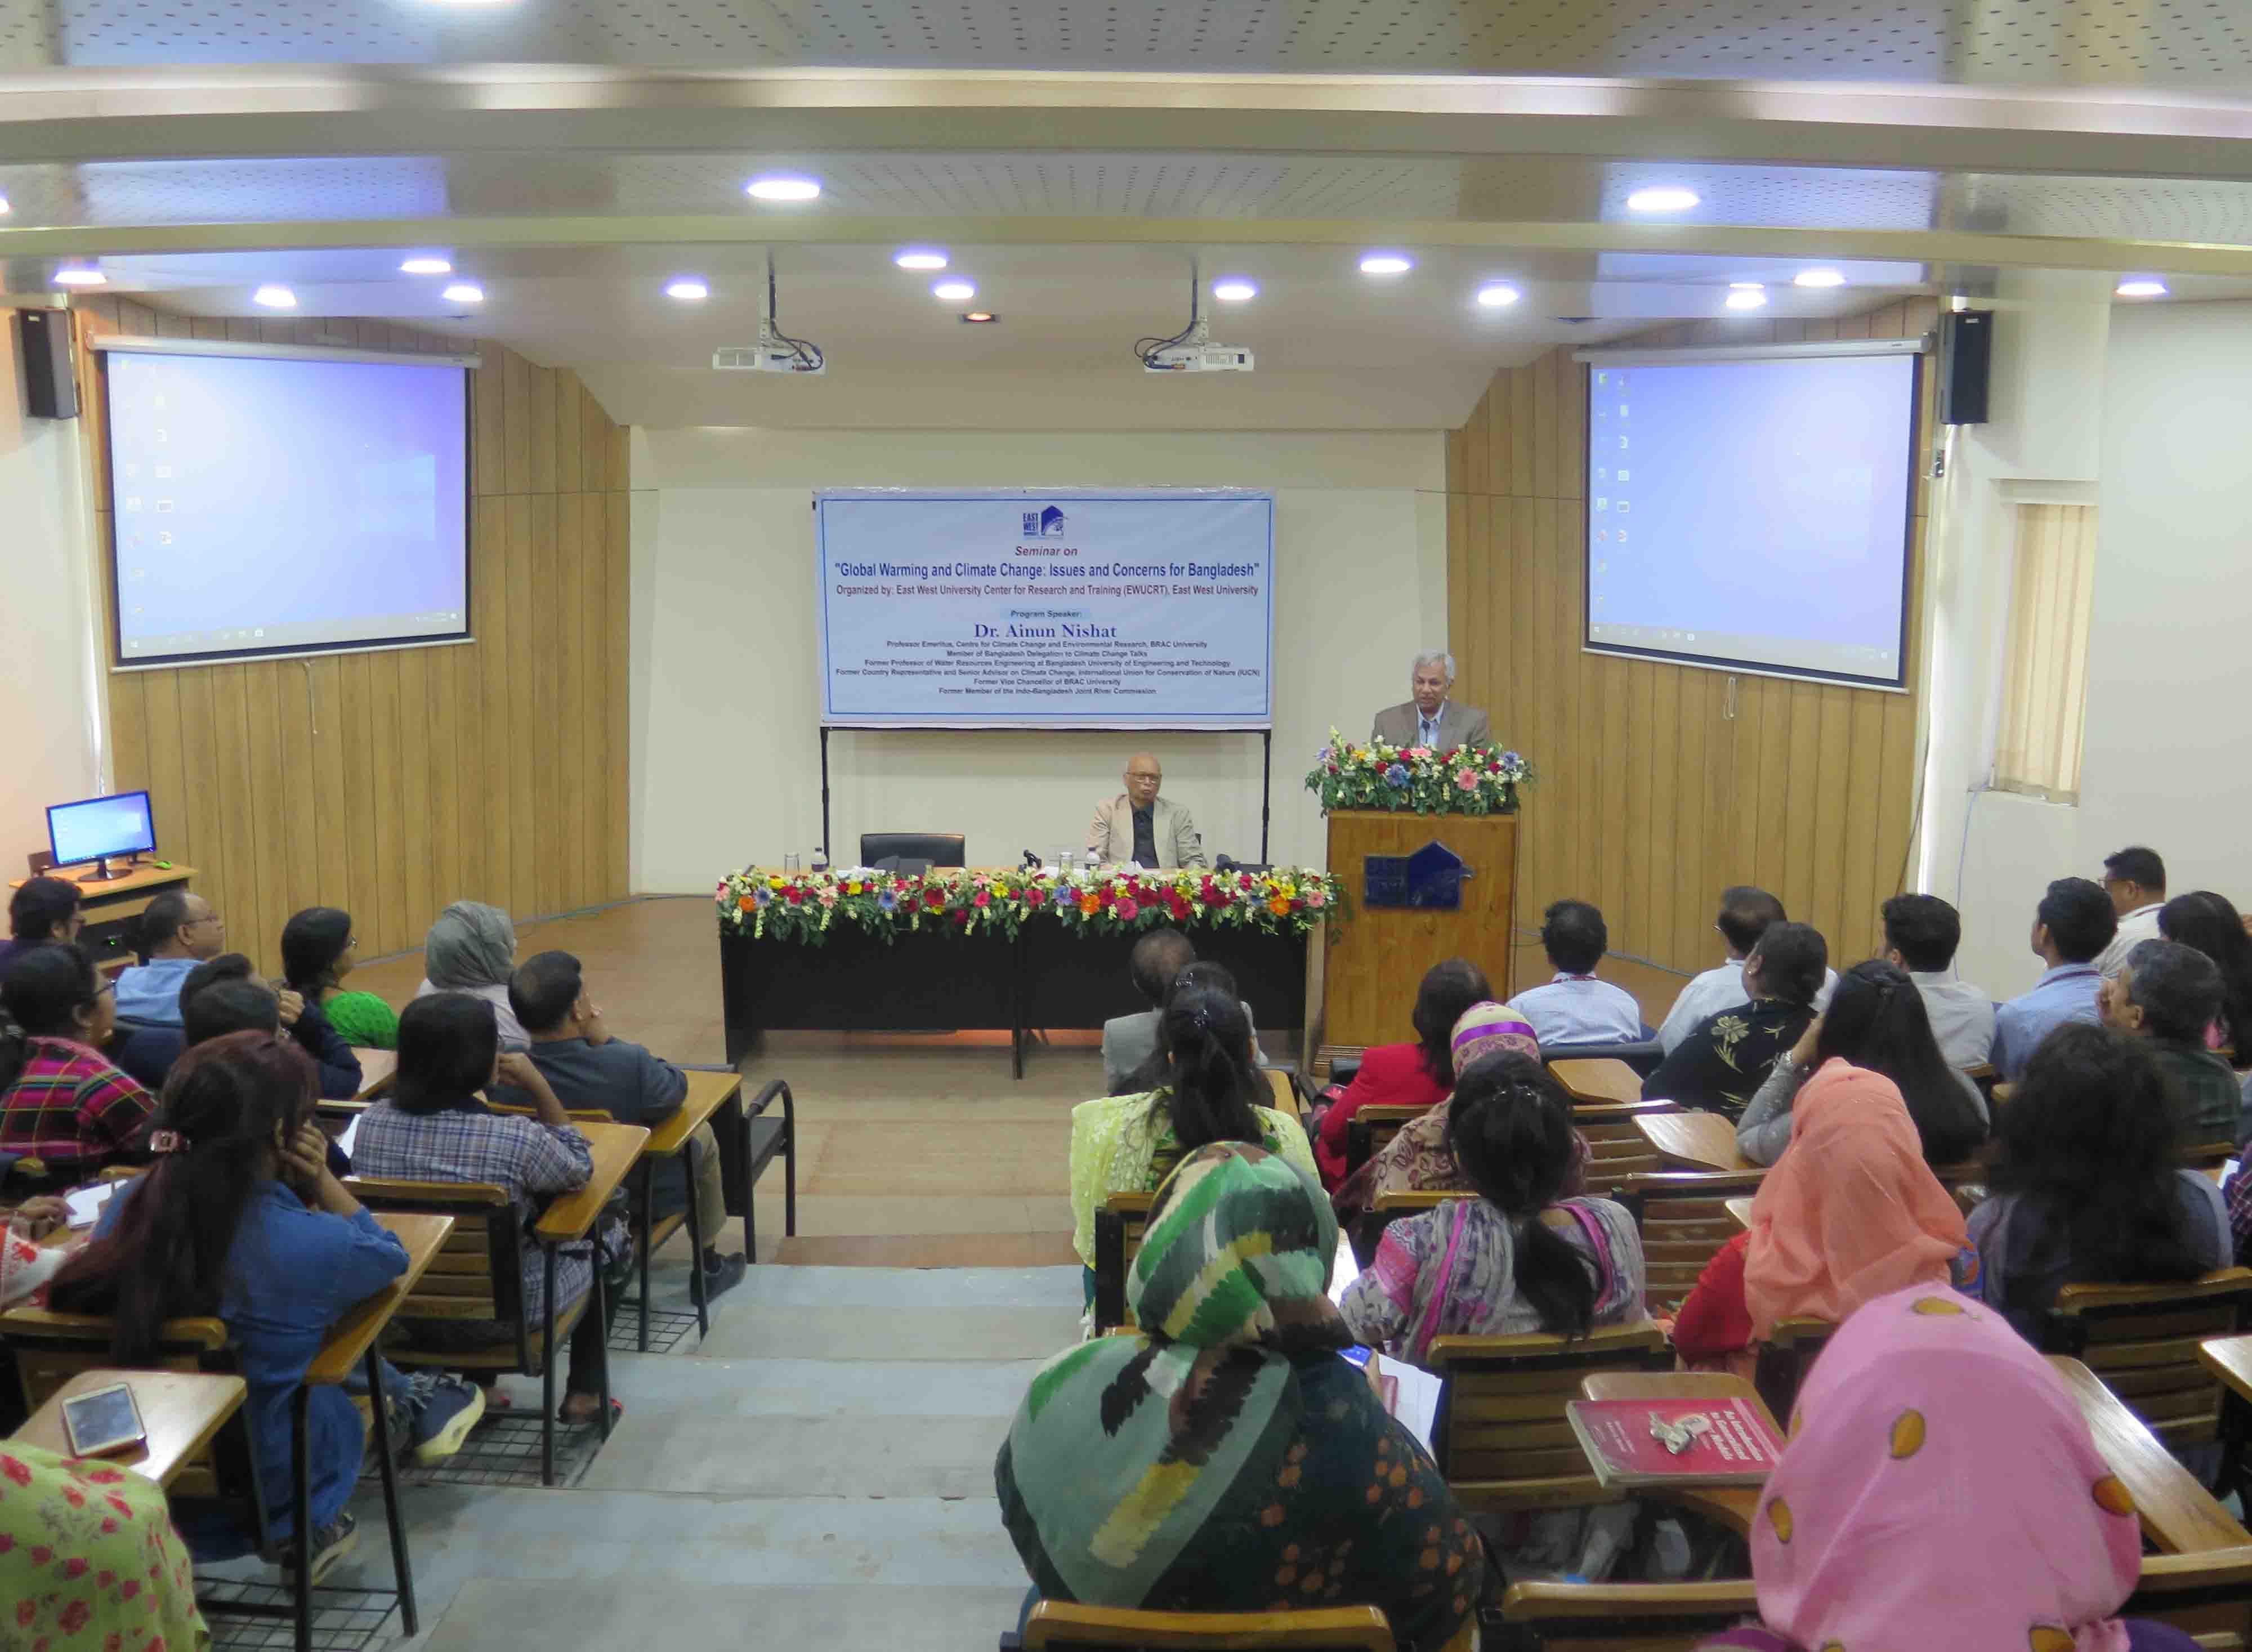 EWU-CRT Organizes a Knowledge Sharing Seminar on Climate Change